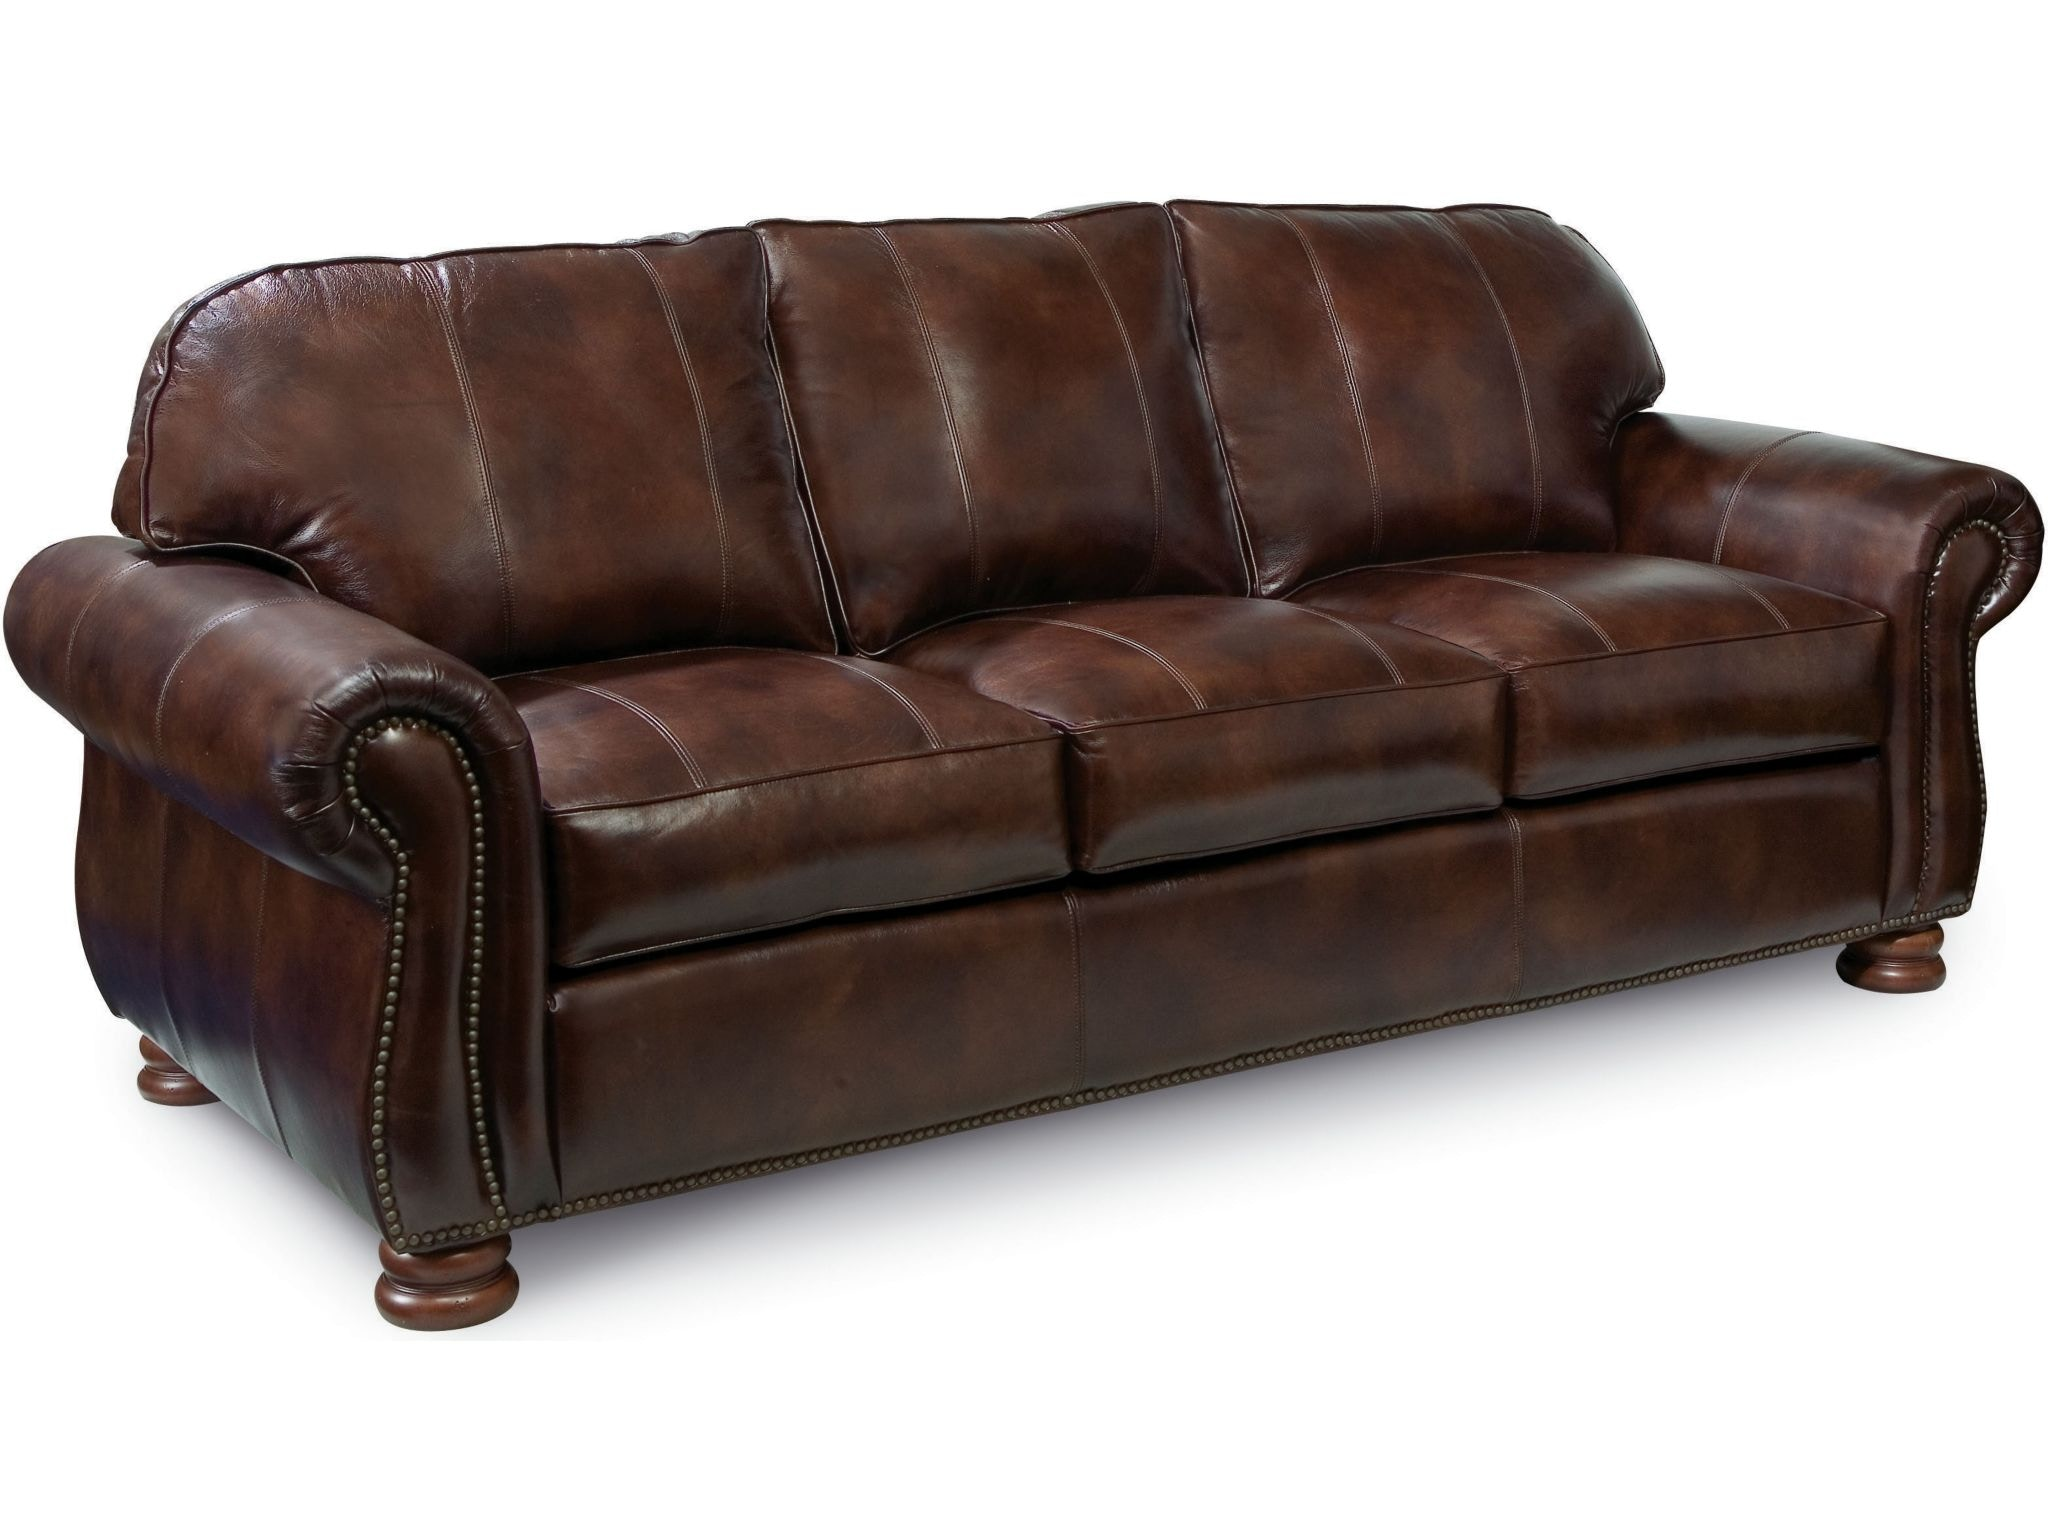 thomasville living room benjamin 3 seat sofa hs1461 31e home rh thomasvillenj com